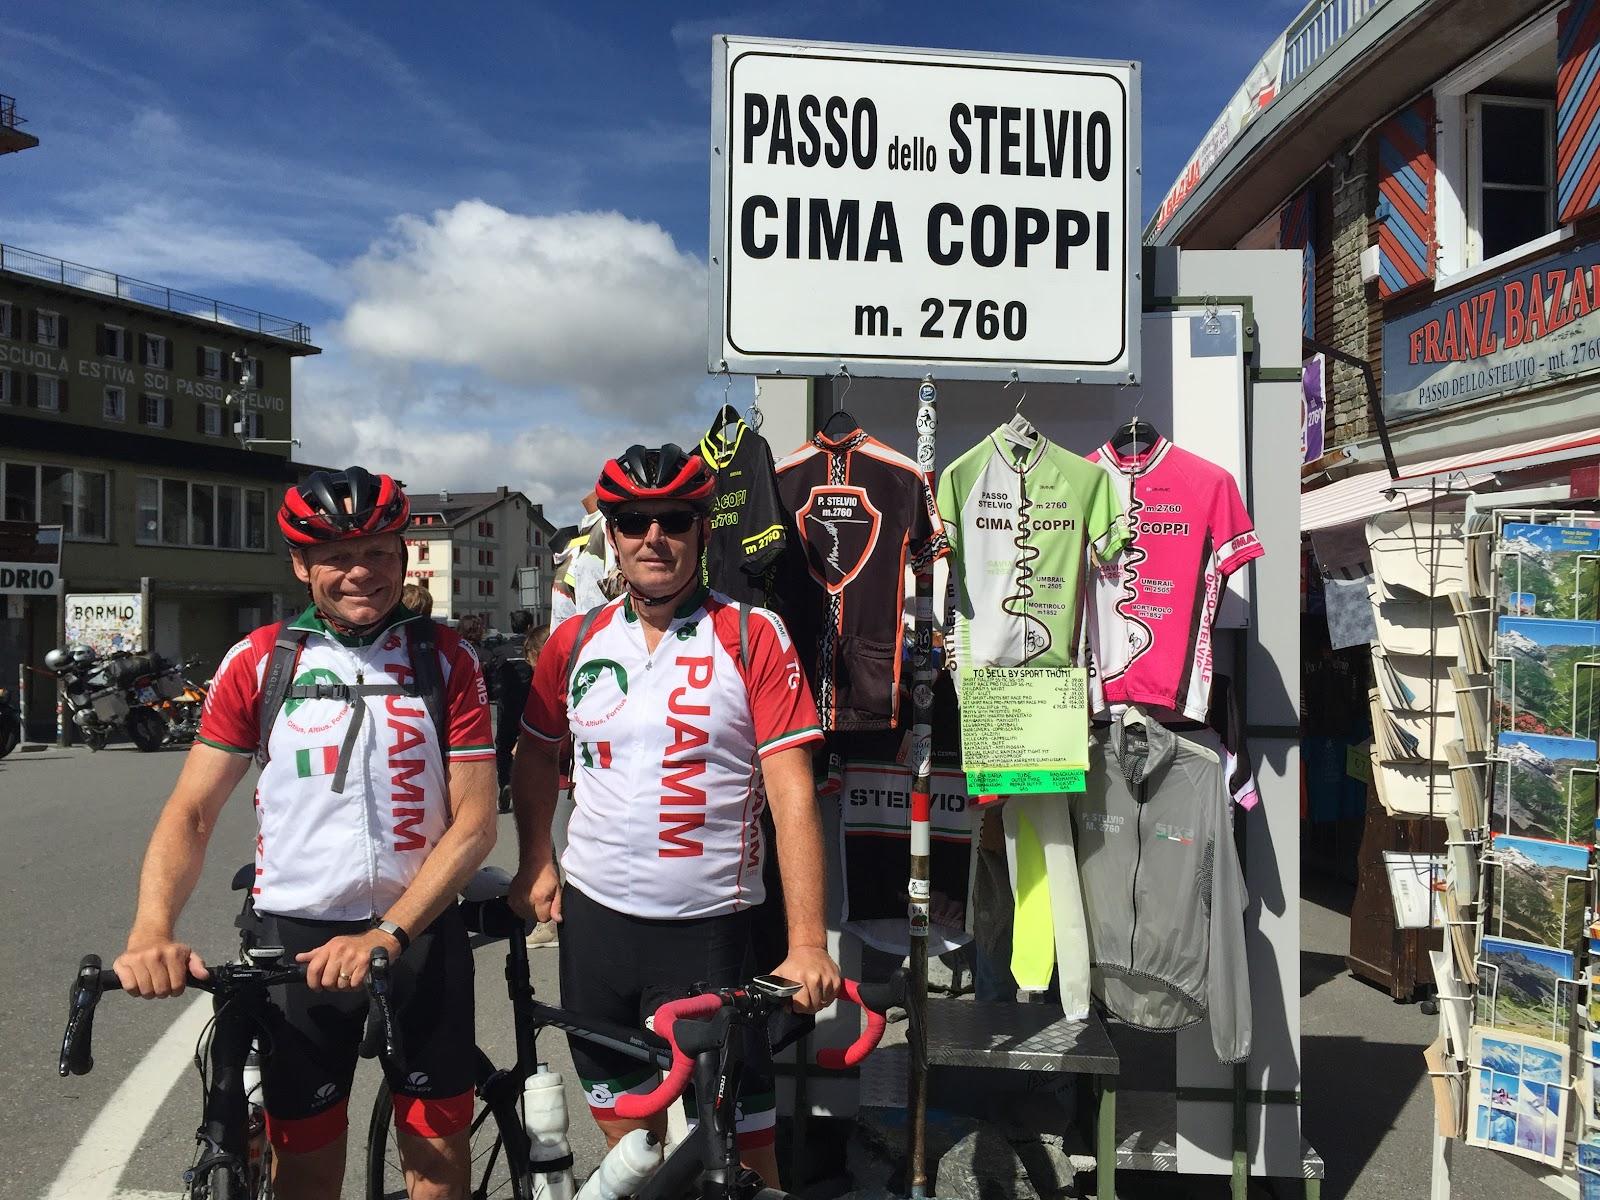 Cycling Passo dello Stelvio - PJAMM Cycling John Johnson and Bill Cappobianco at the Passo sign